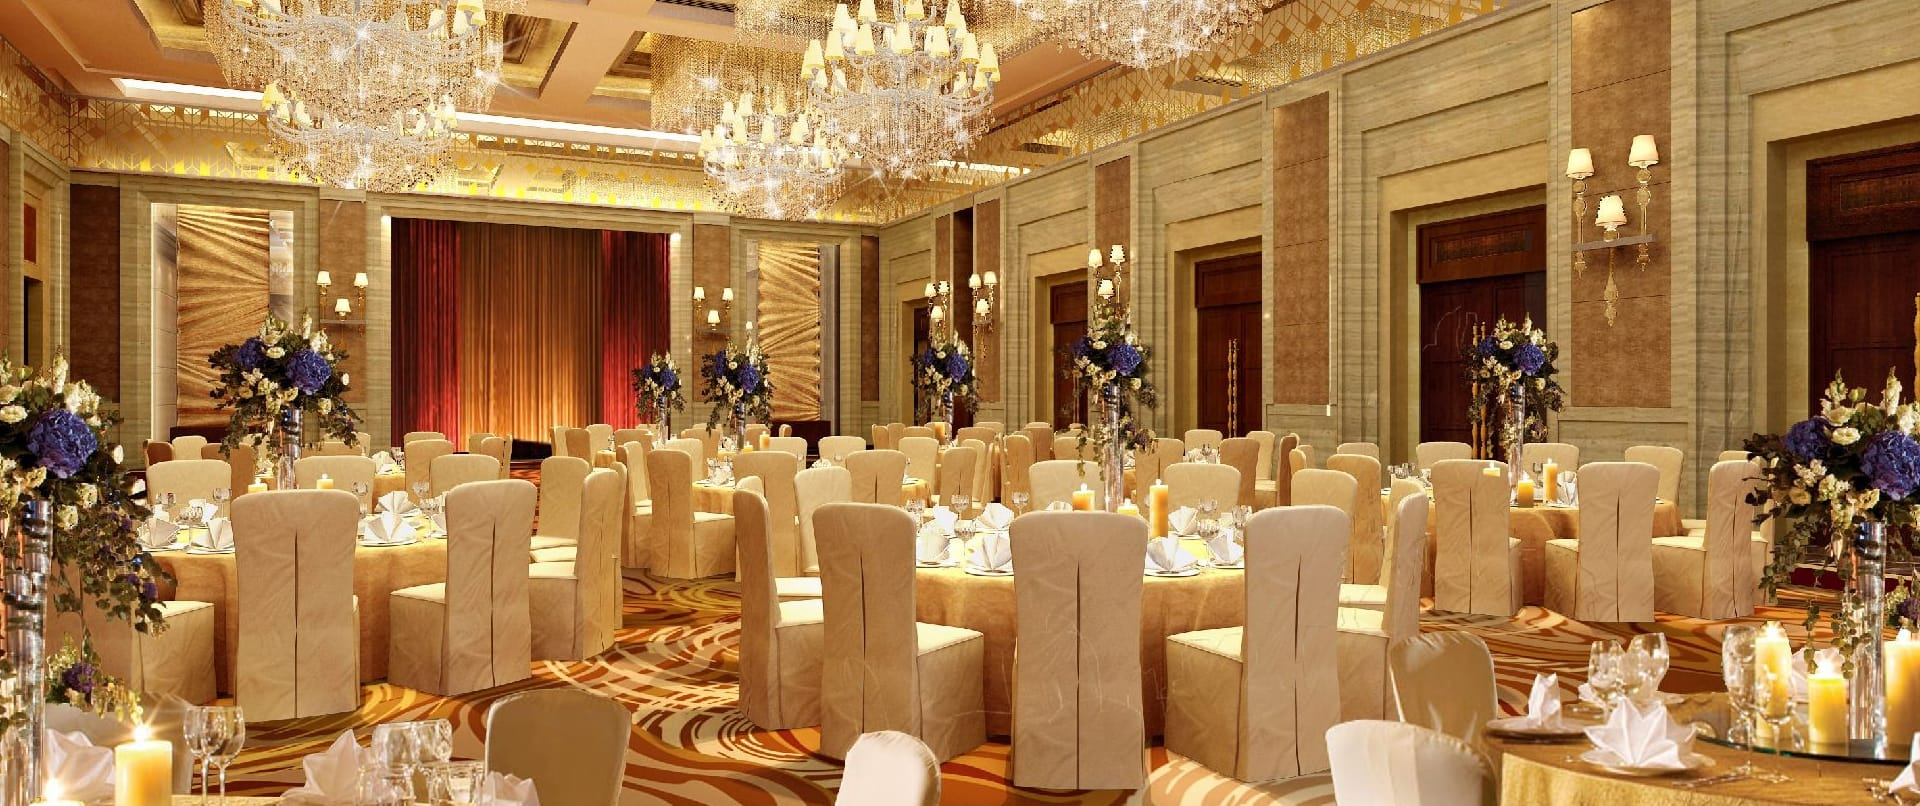 Ballroom Function Room